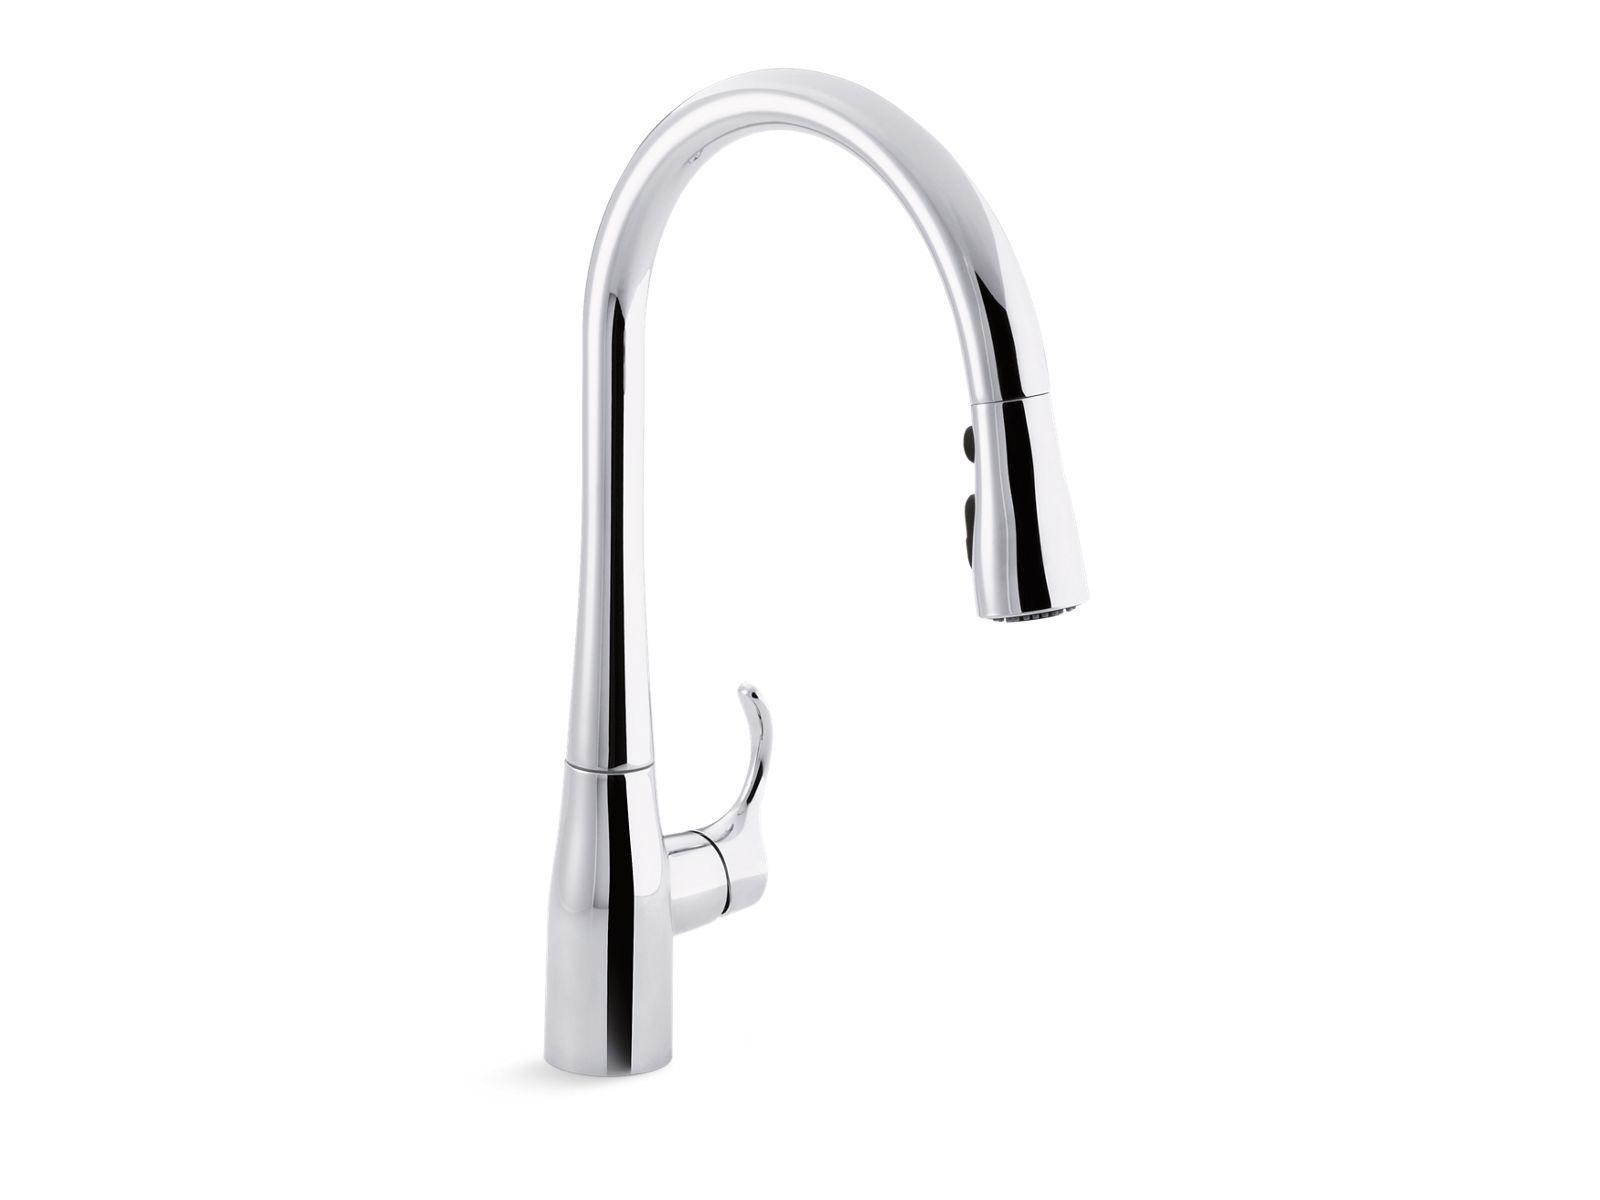 k 596 simplice single handle kitchen sink faucet kohler